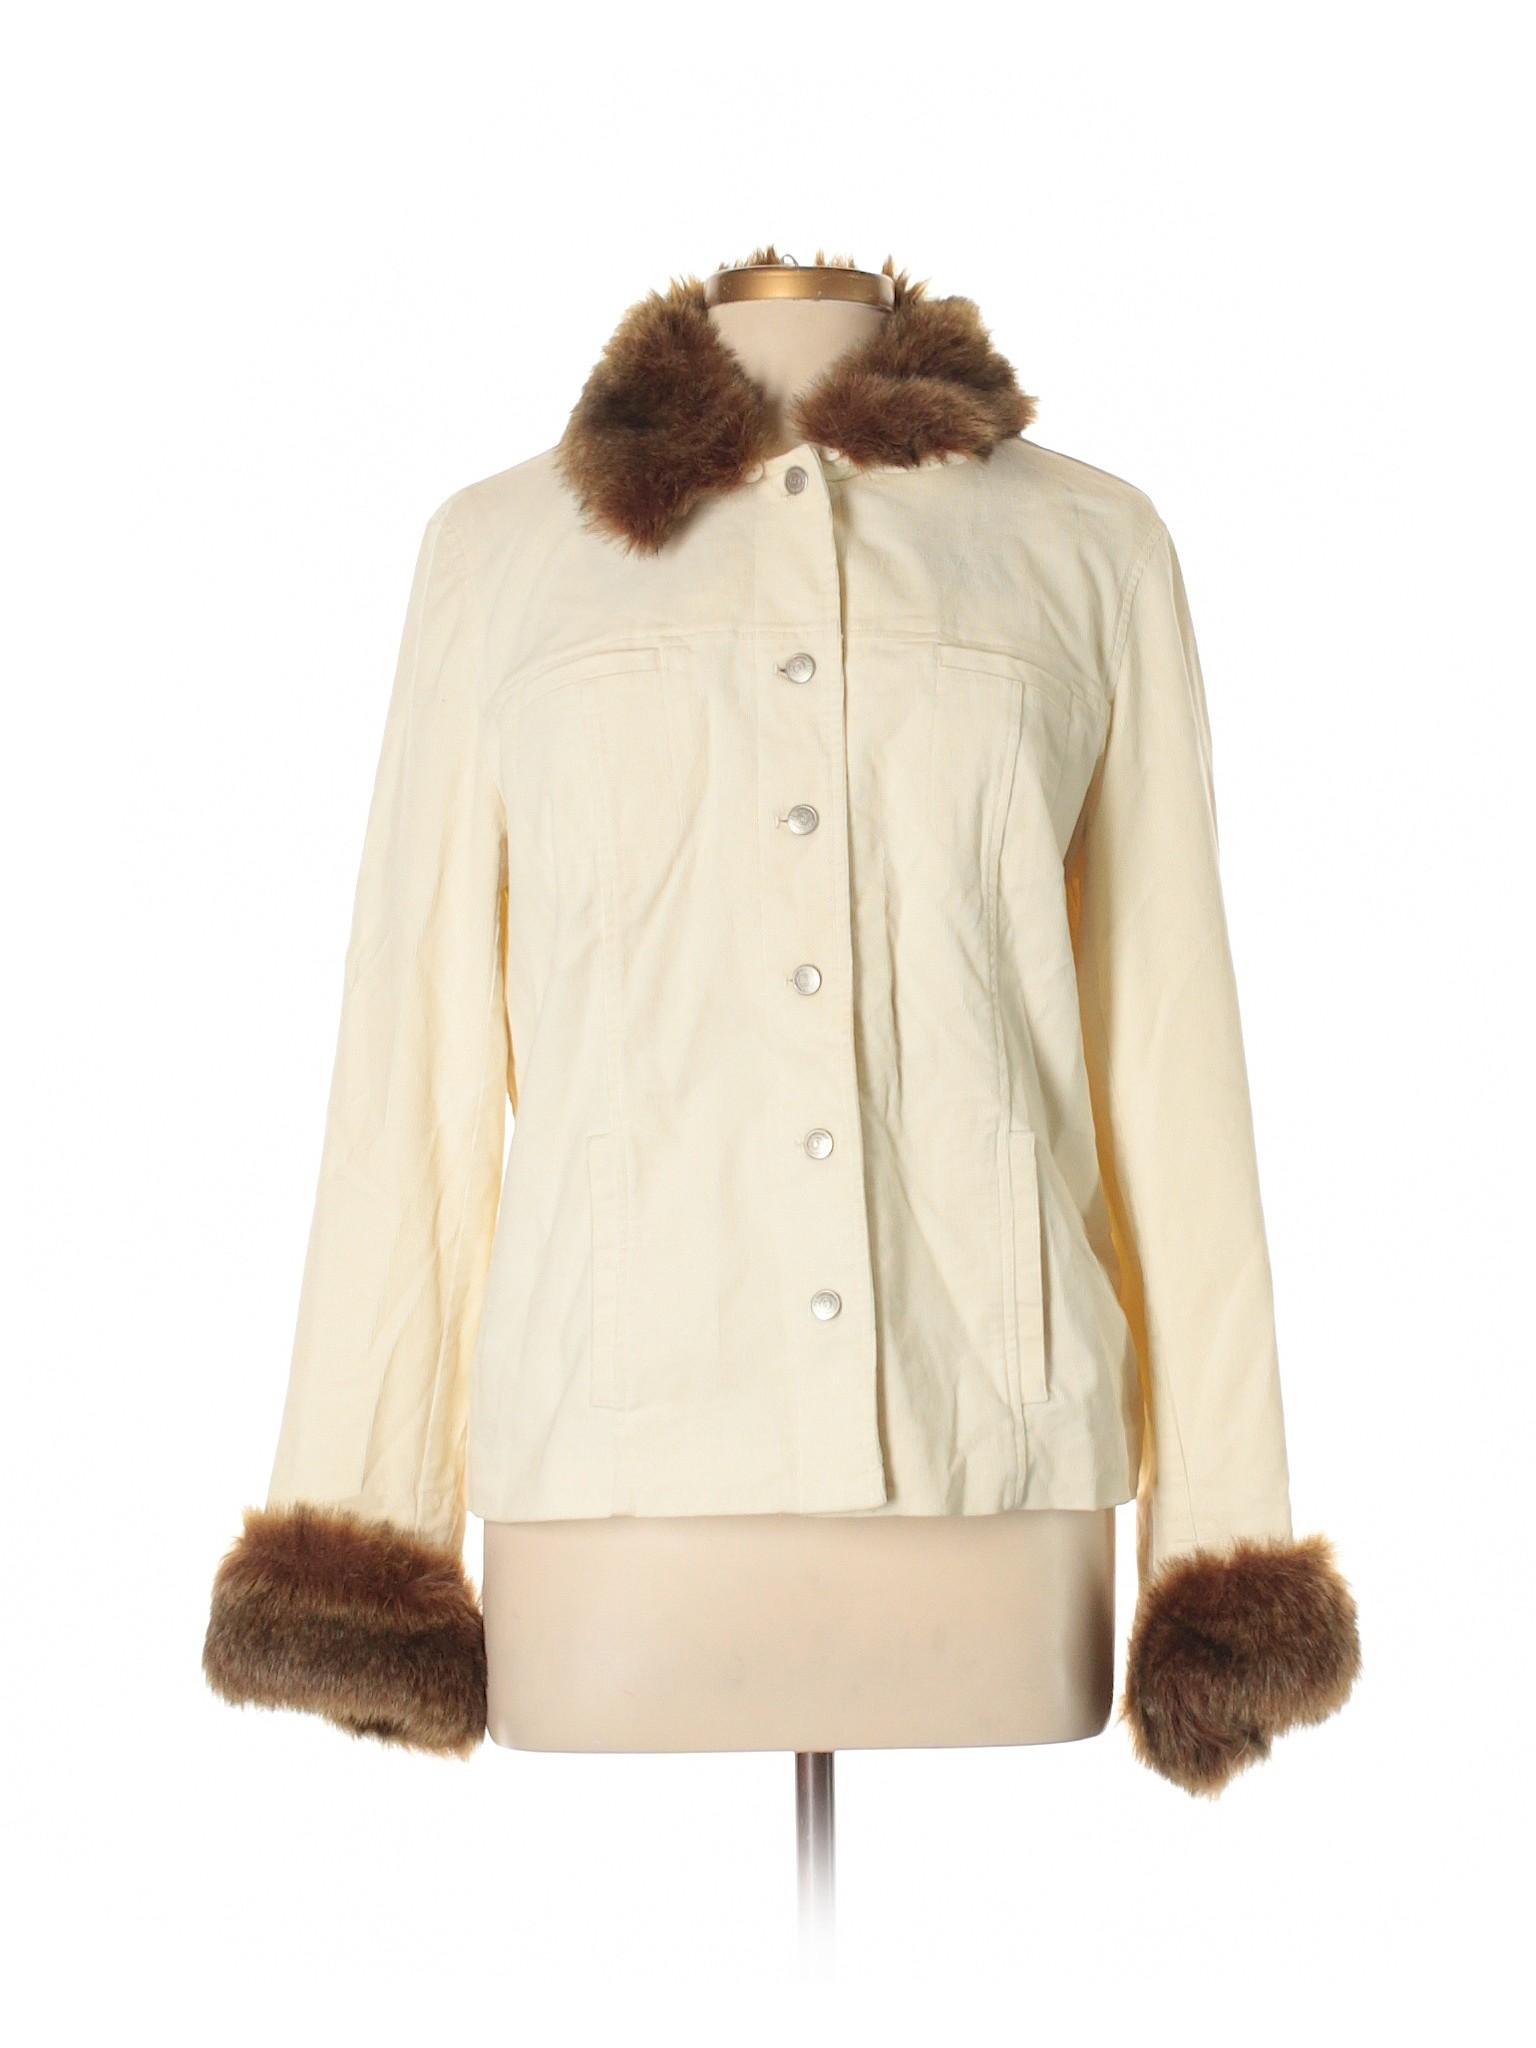 Signature Denim York Leisure Jacket winter Jones New qvwCCHax